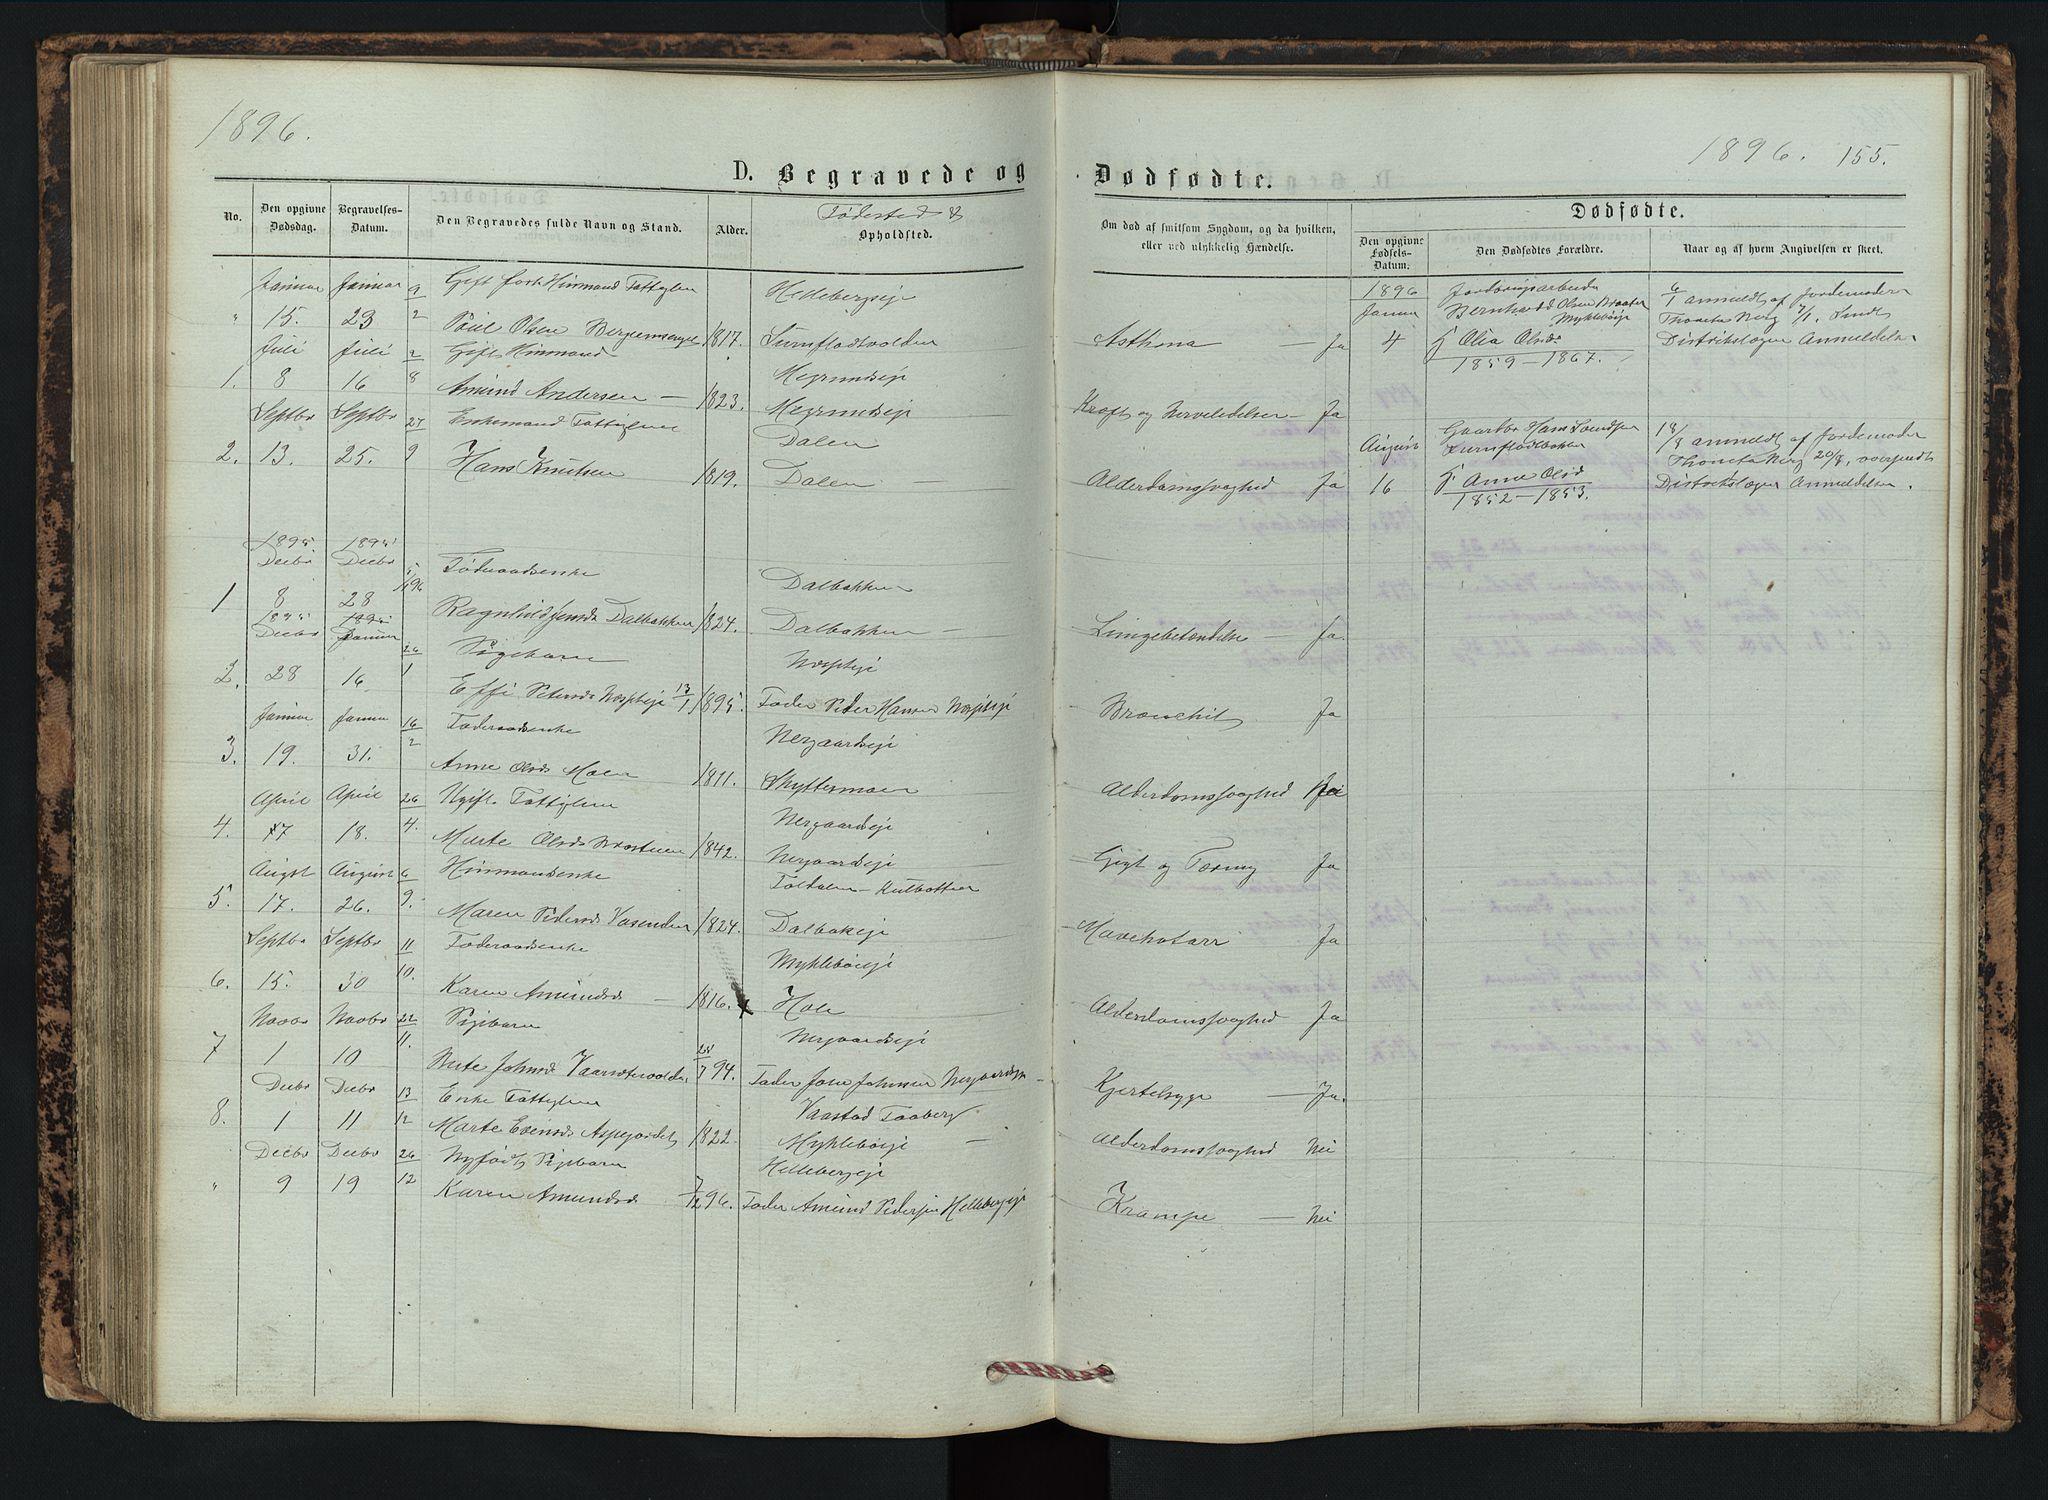 SAH, Vestre Gausdal prestekontor, Klokkerbok nr. 2, 1874-1897, s. 155